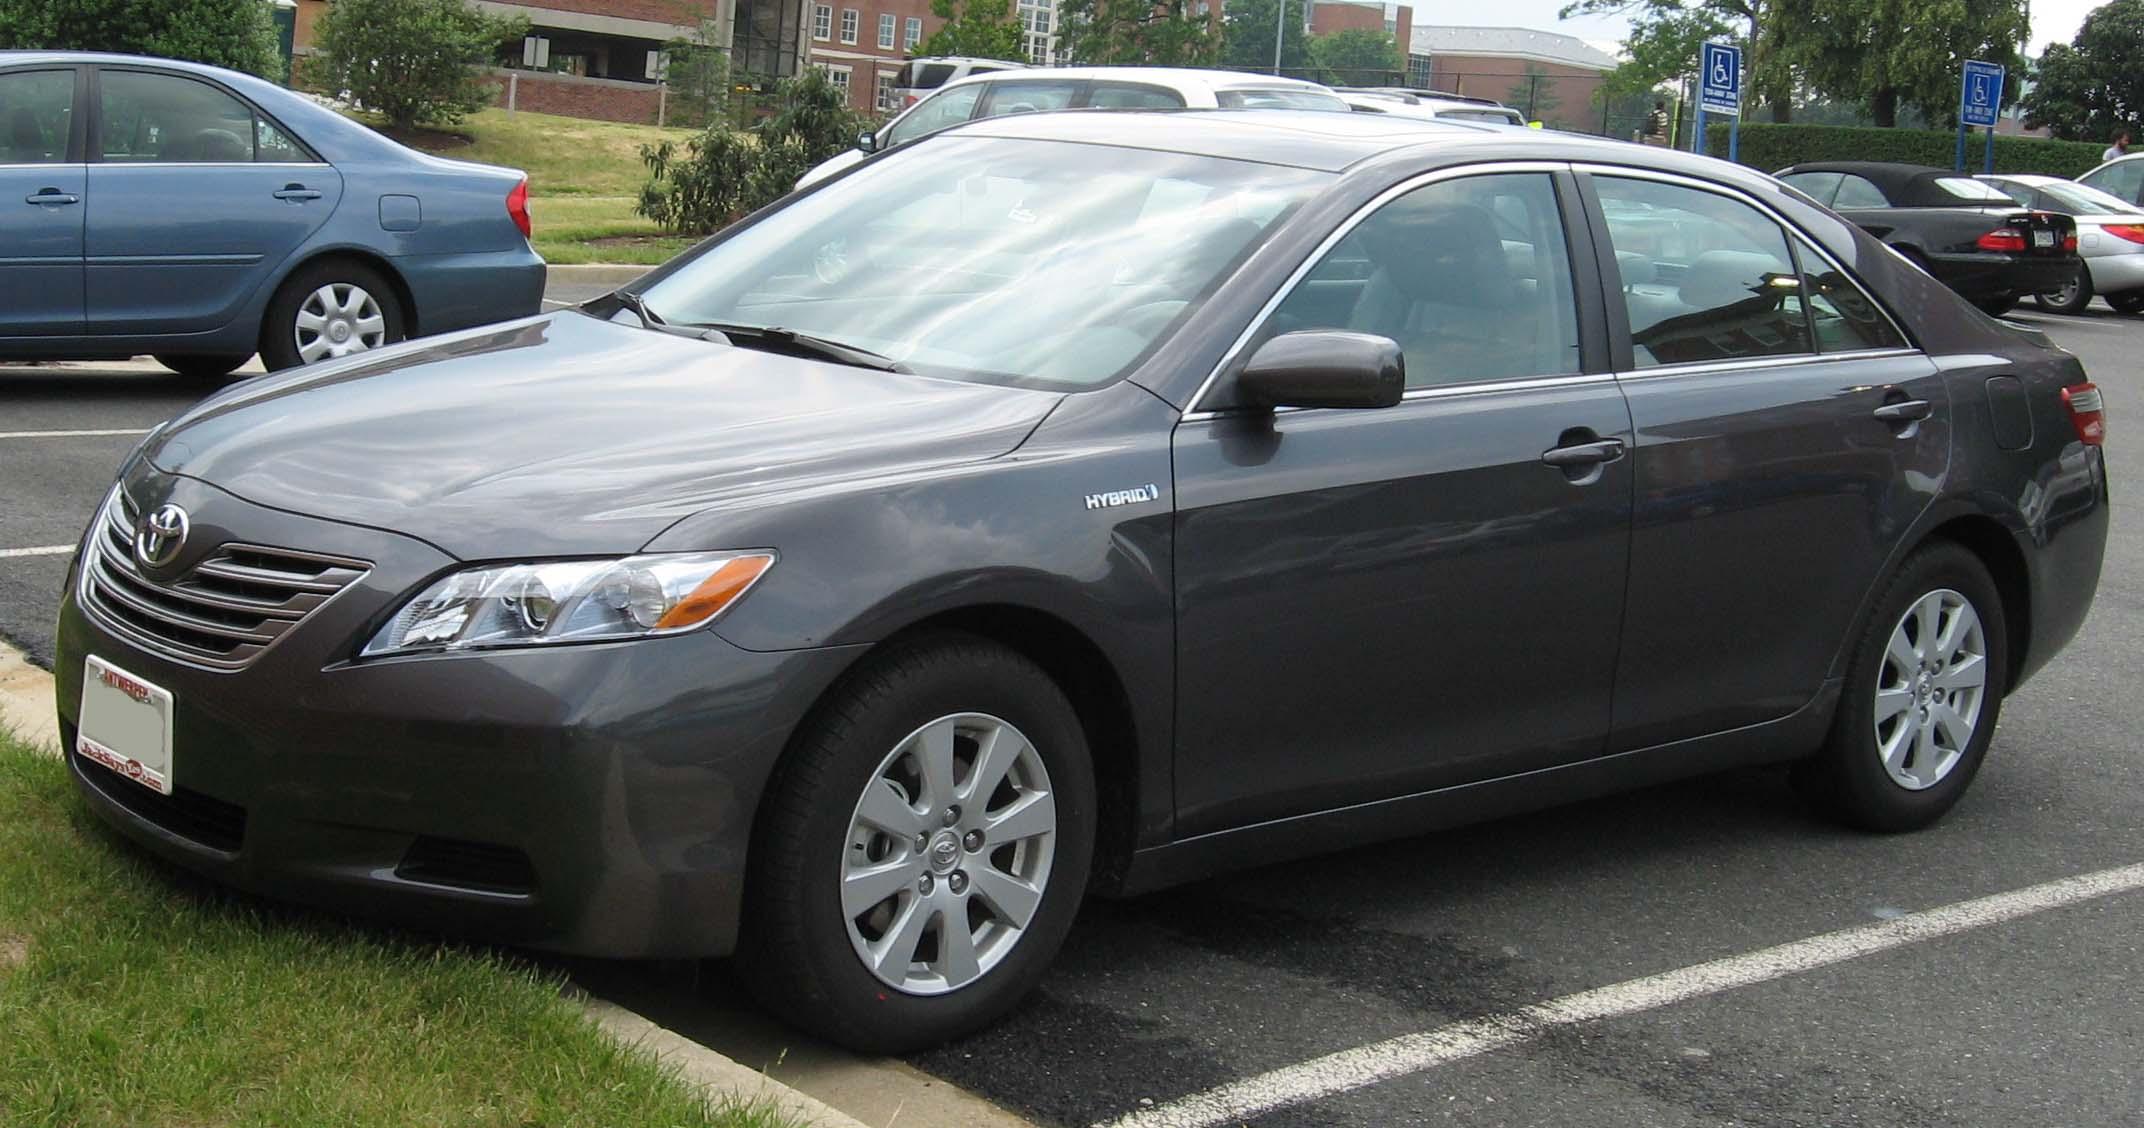 2007 Toyota Camry Hybrid Image 18